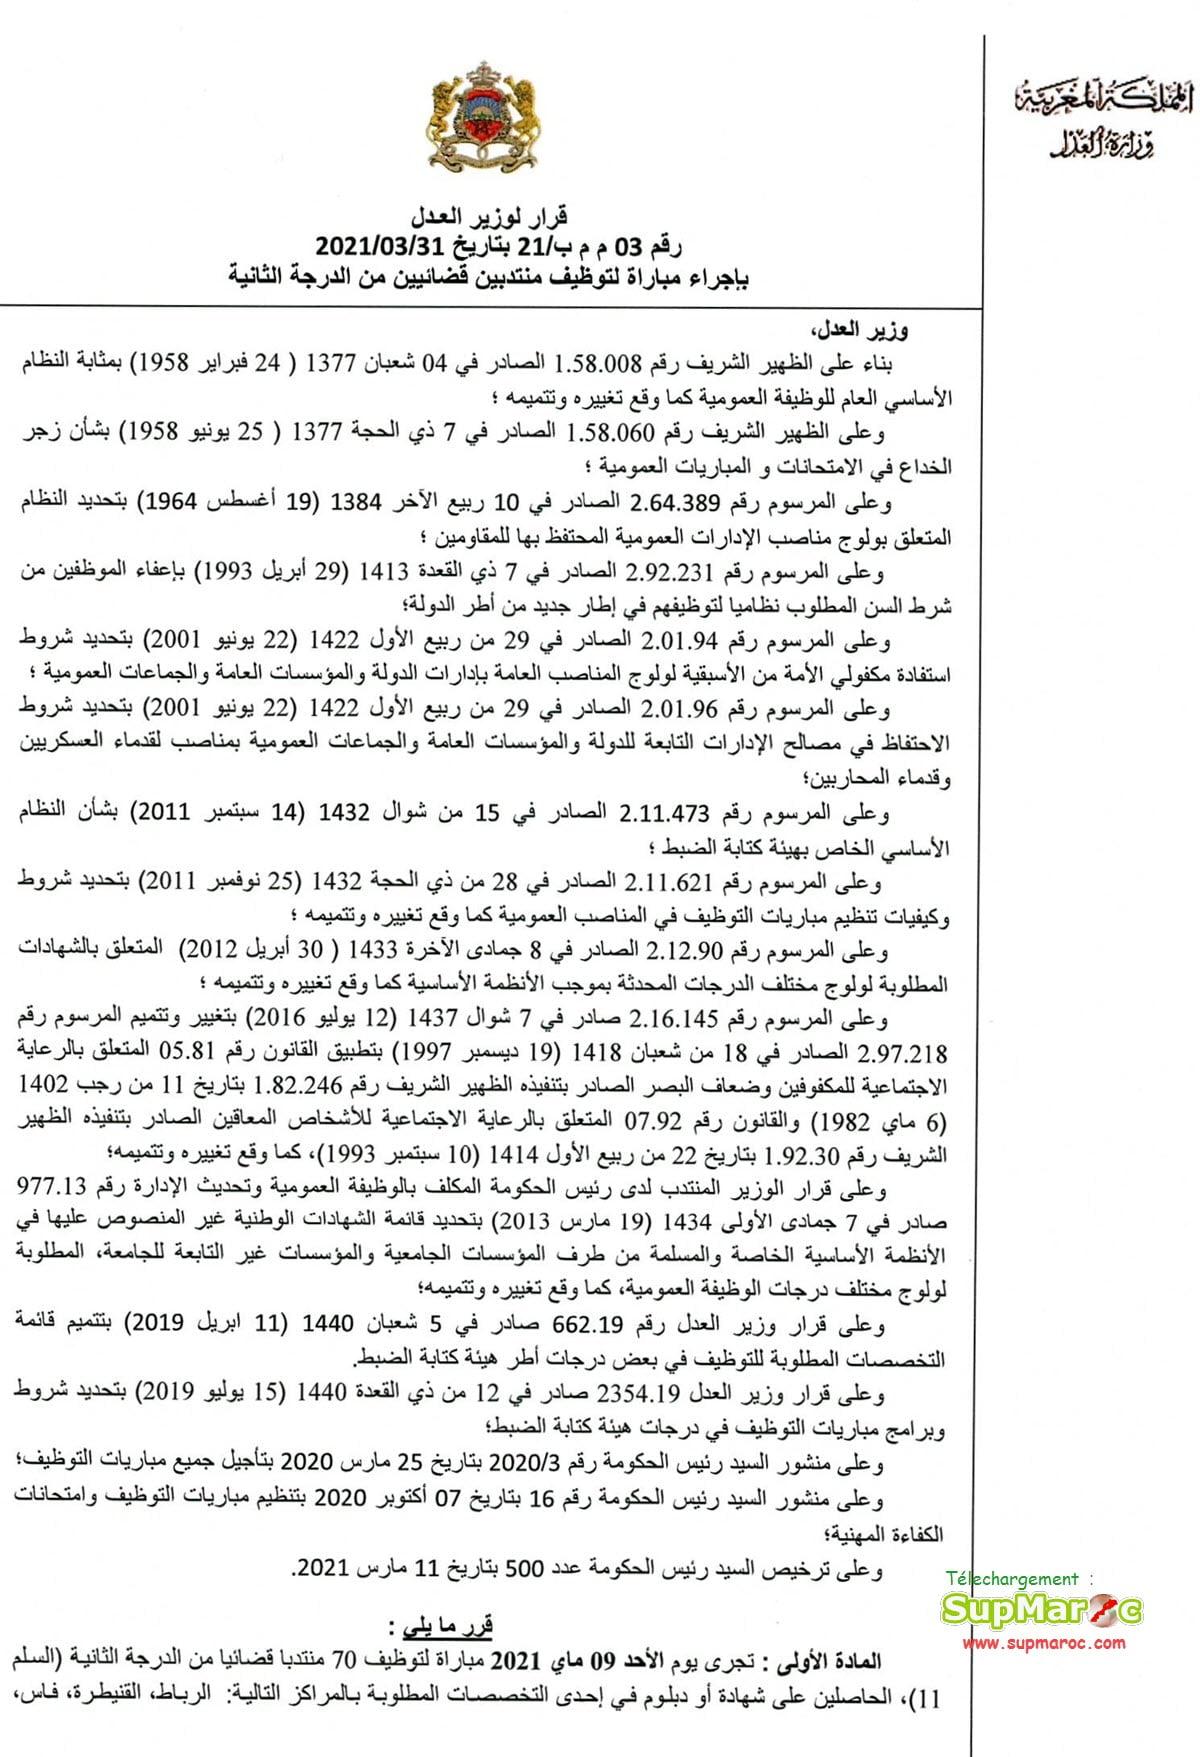 concours de recrutement de 70 Attachés de justice مباراة لتوظيف 70 منتدبا قضائيا وزارة العدل 2021